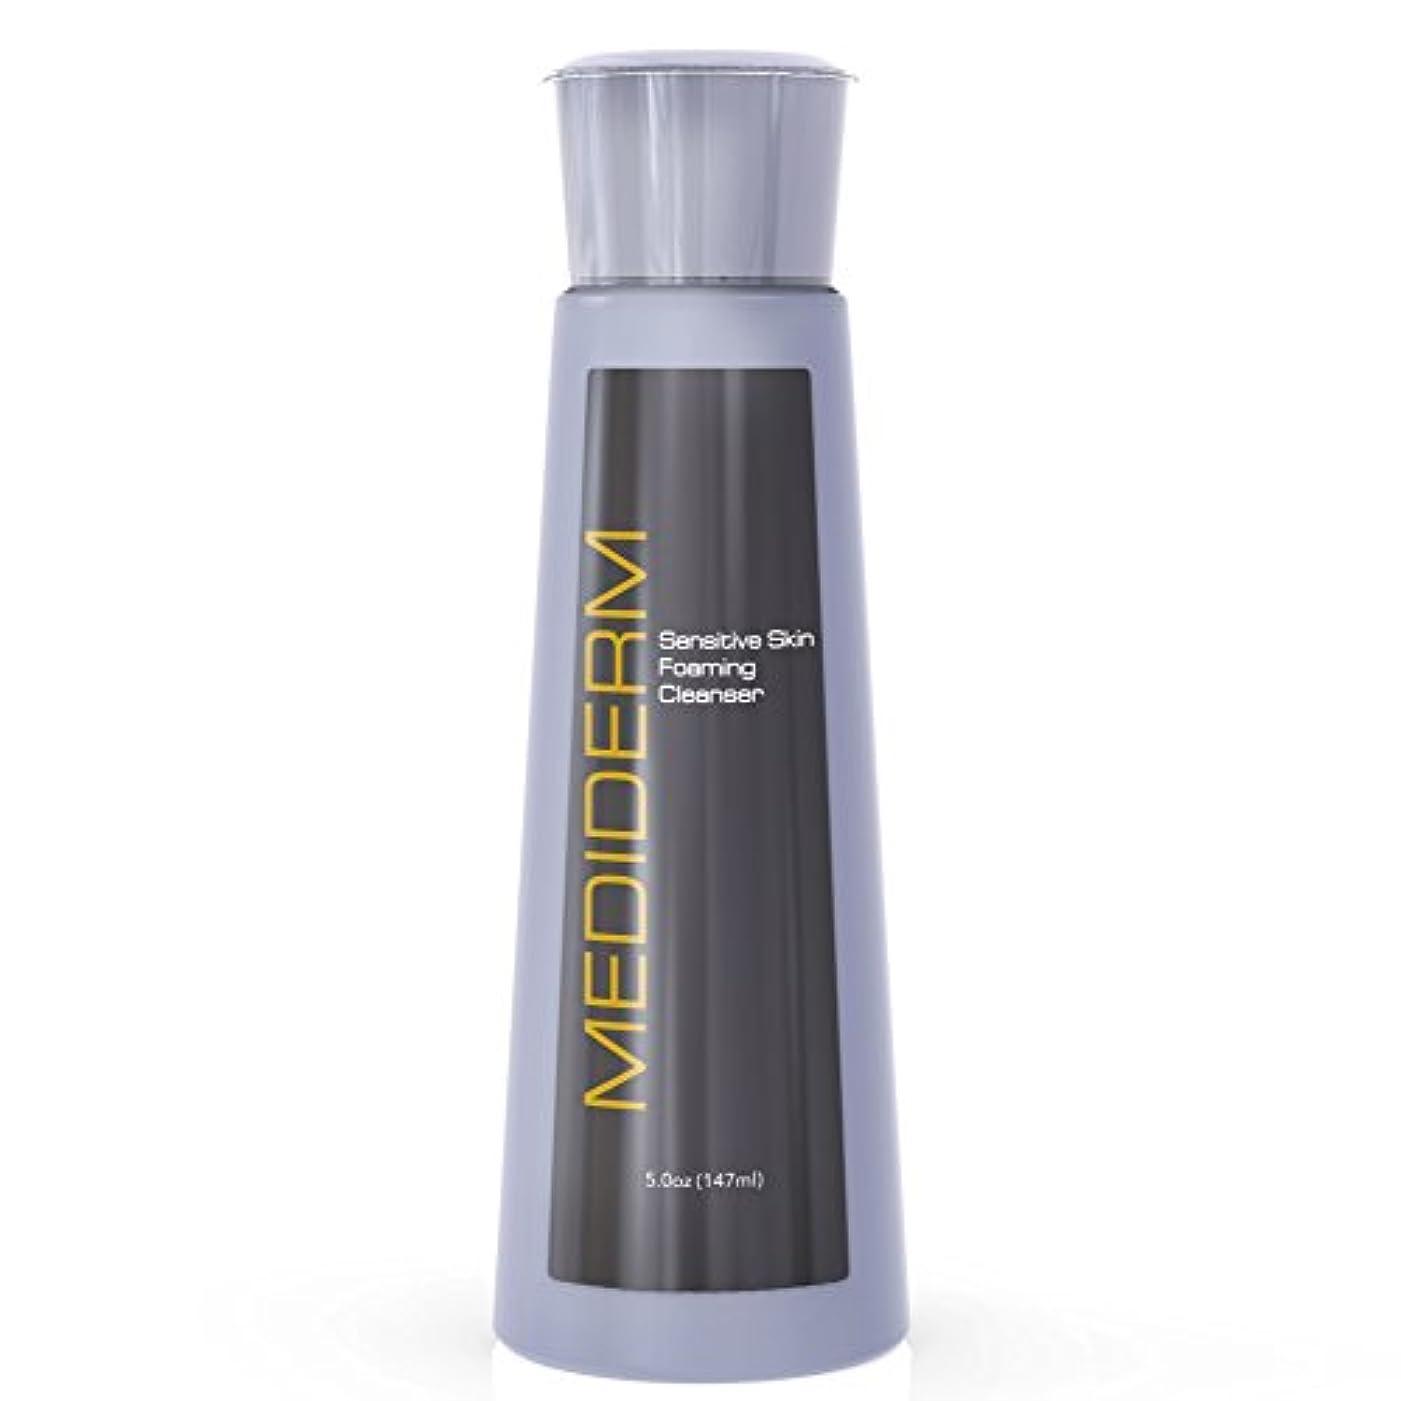 MediDermフェイシャルフォーミングクレンザー、敏感肌、穏やかなフェイスウォッシュが不純物を除去し、栄養を与え、男性と女性のスキンを保護します。 7オンス